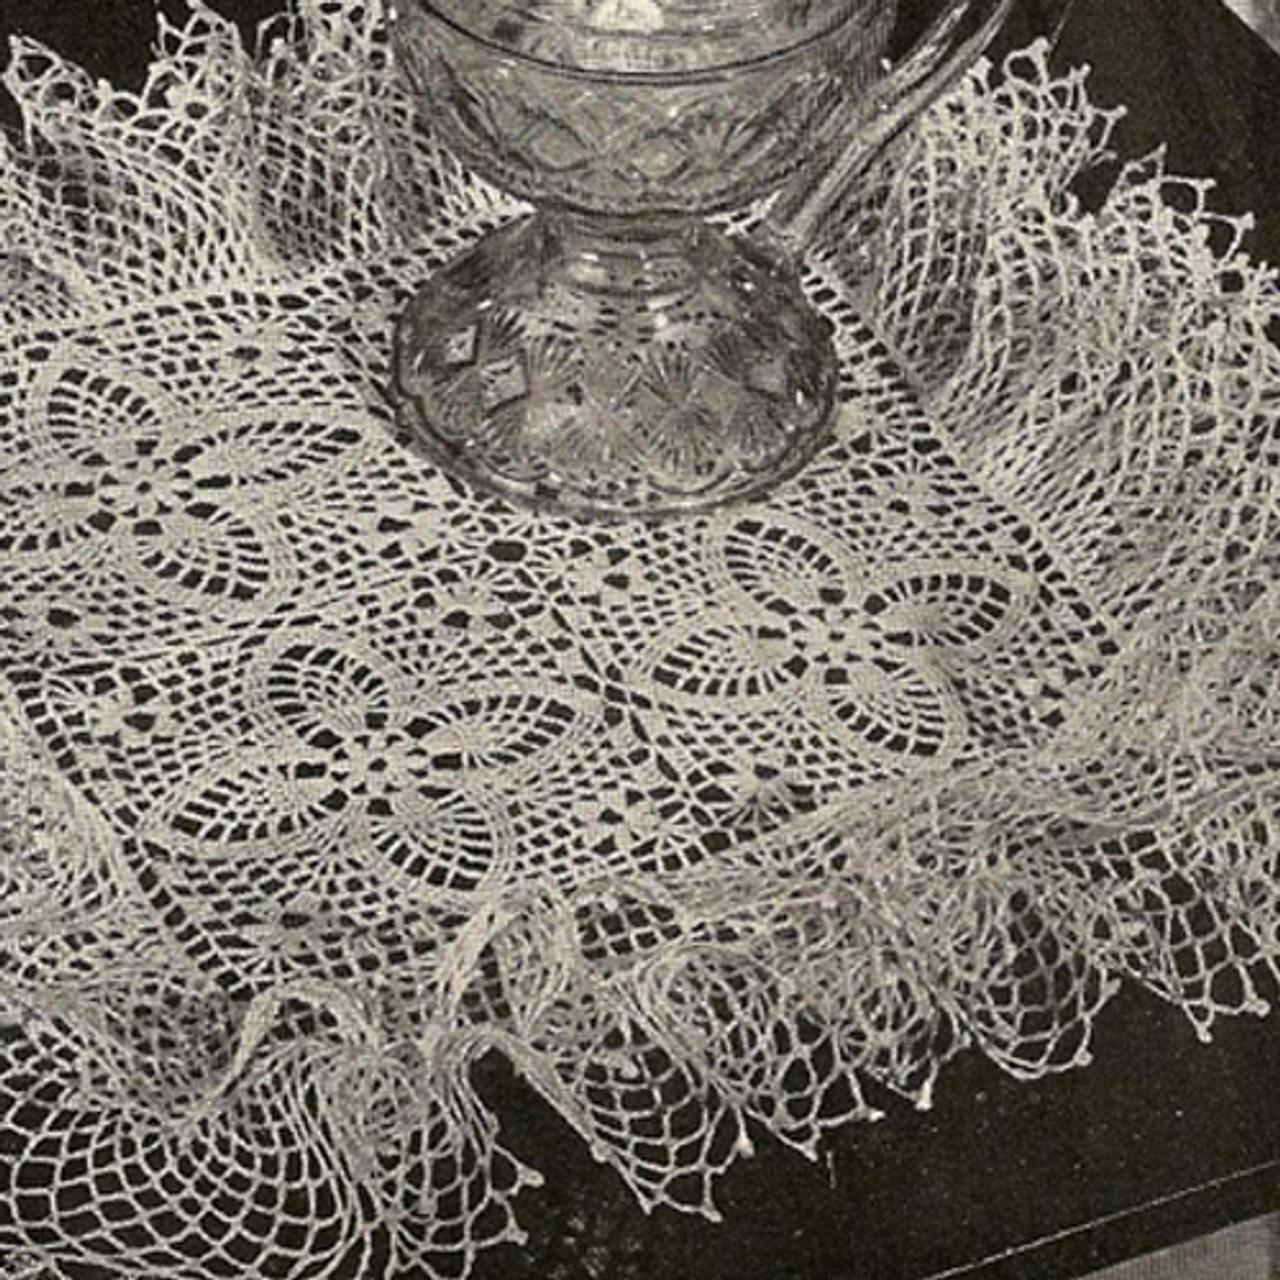 Vintage 1940s Square Crochet Doily Pattern